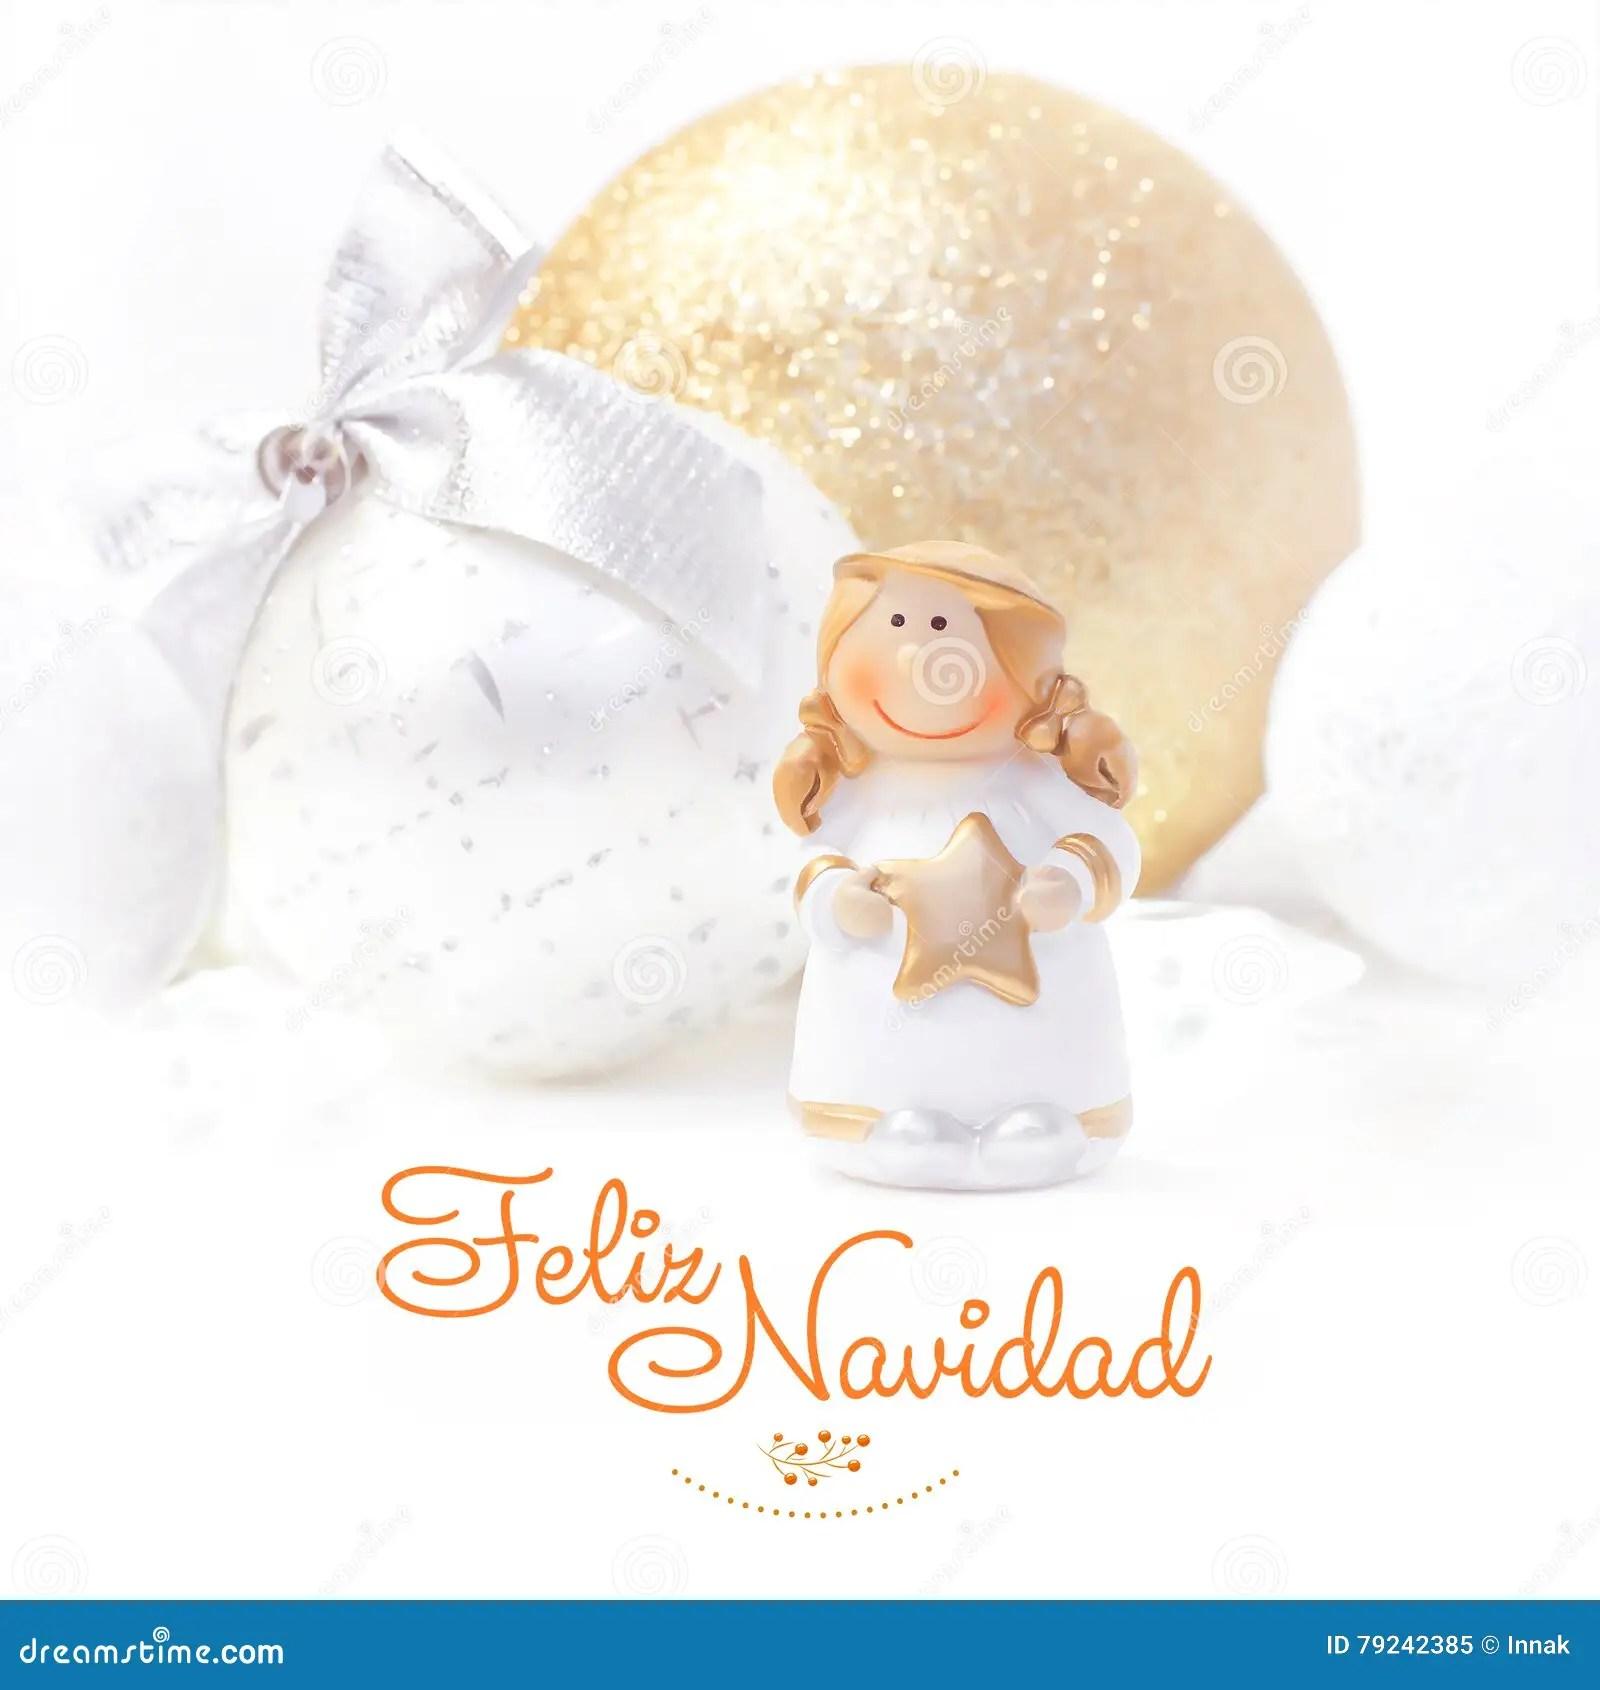 Feliz Navidad Christmas And New Year Background